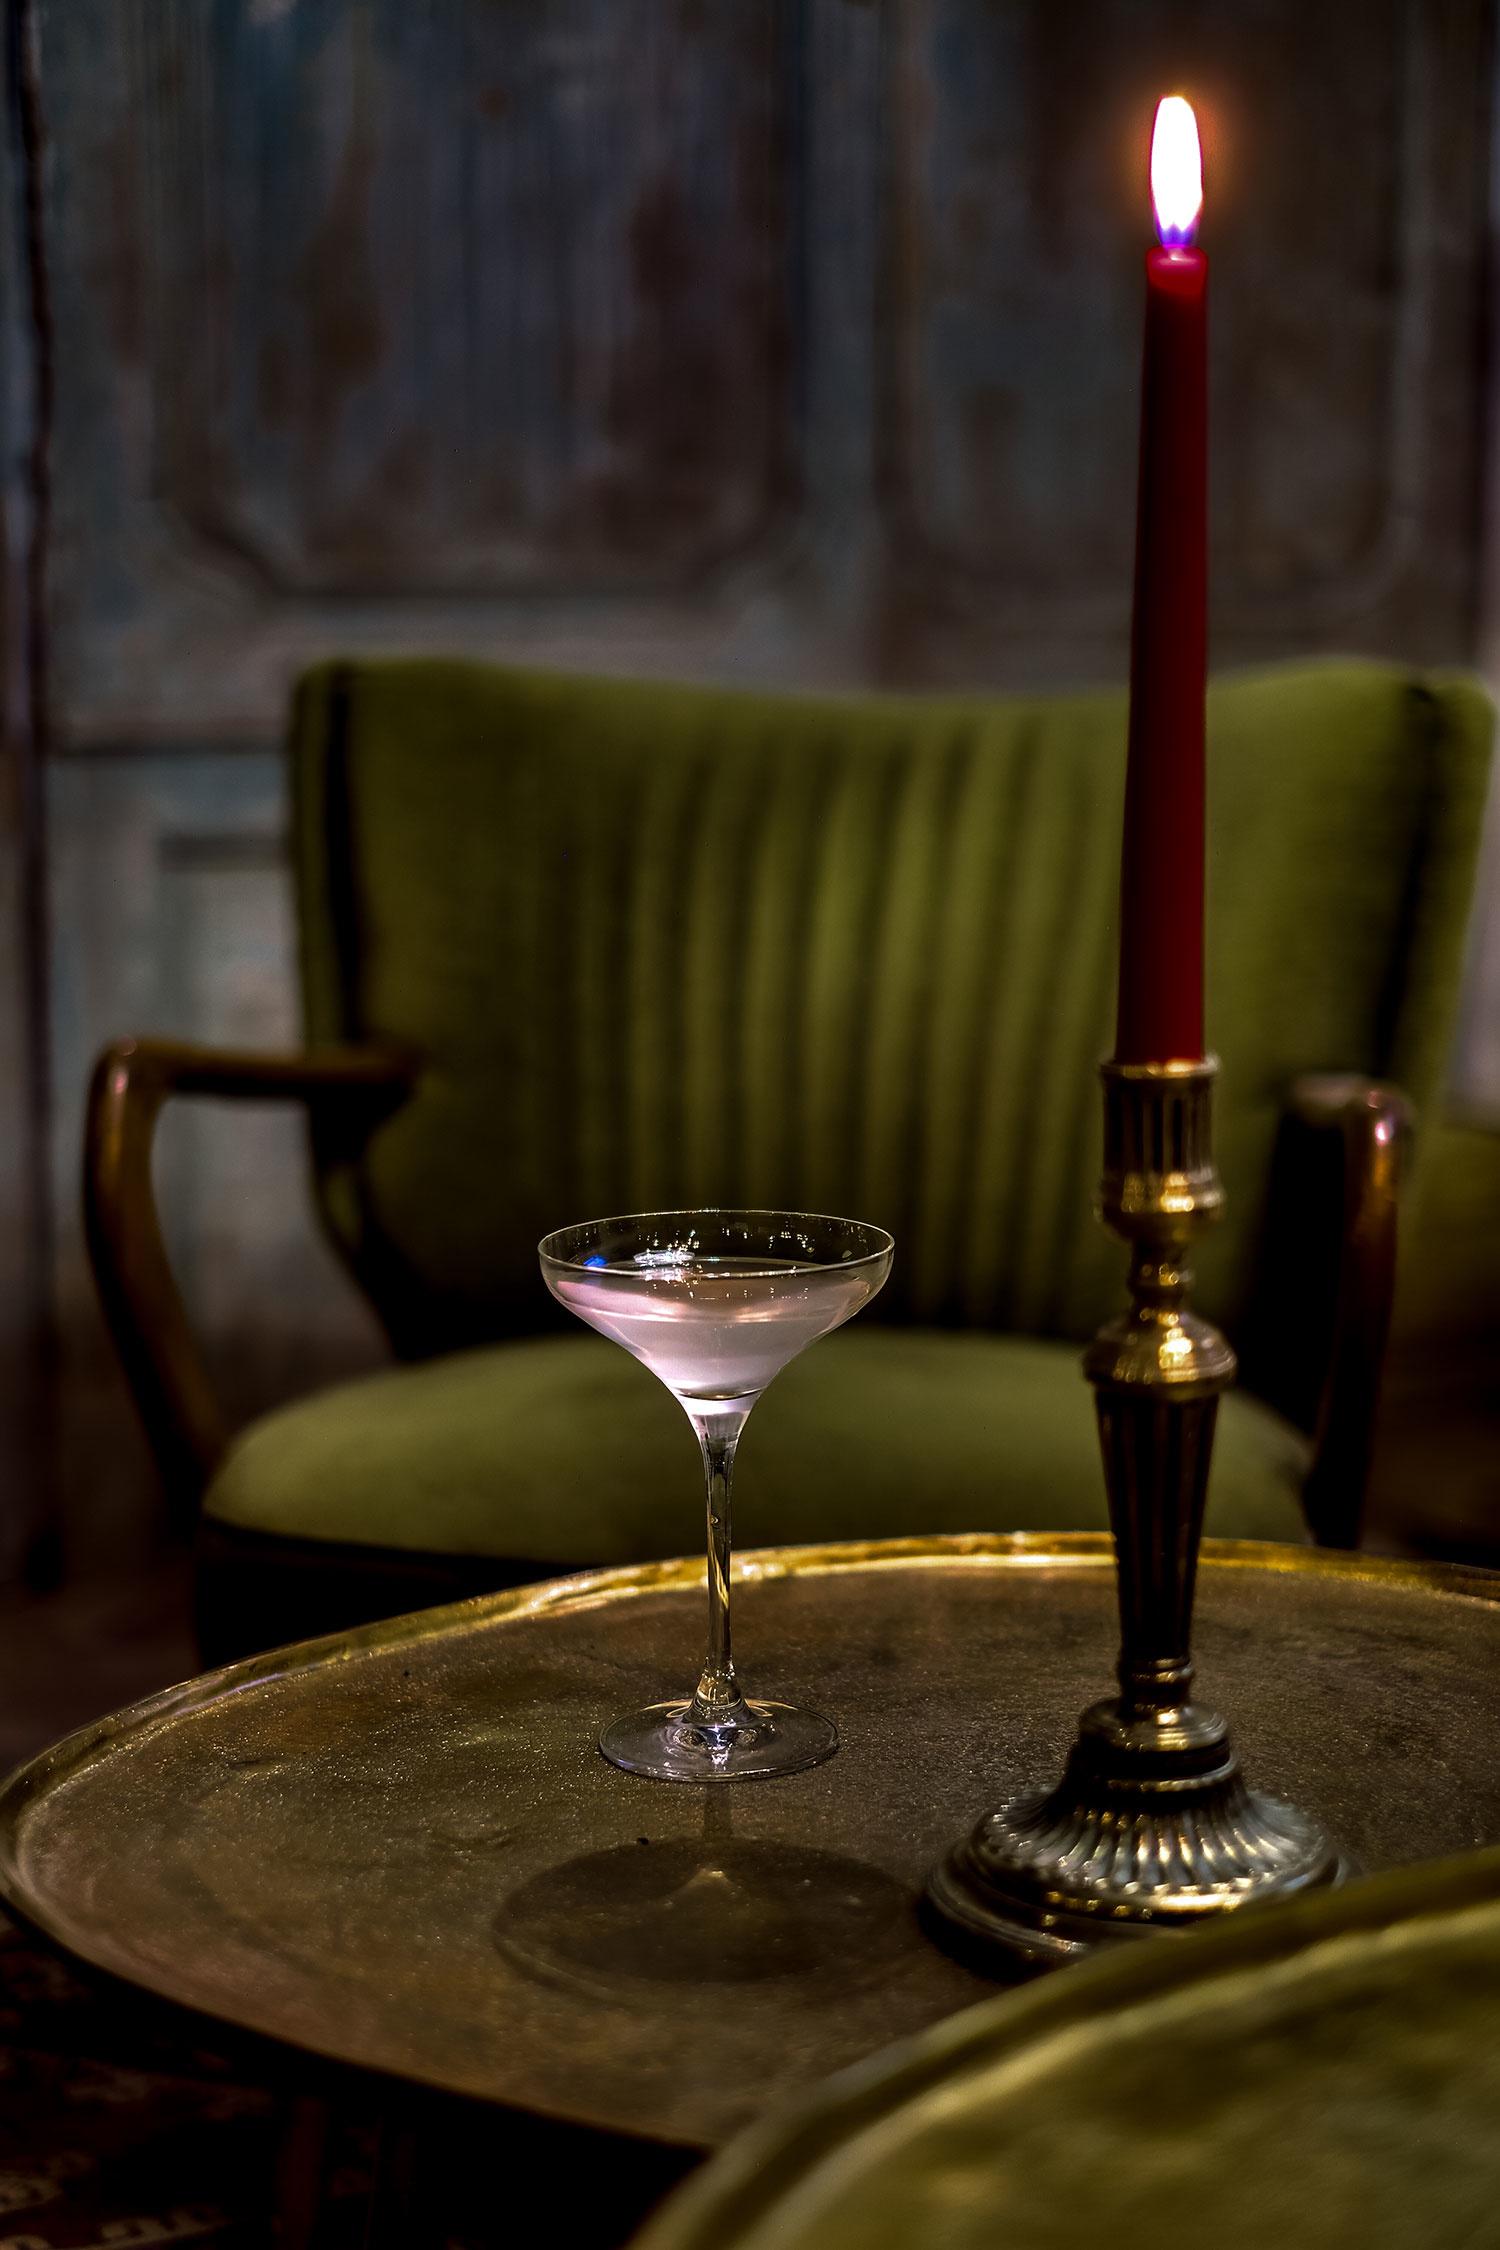 Парижский ресторан Jacopo – проект Натальи Белоноговой (галерея 20, фото 0)